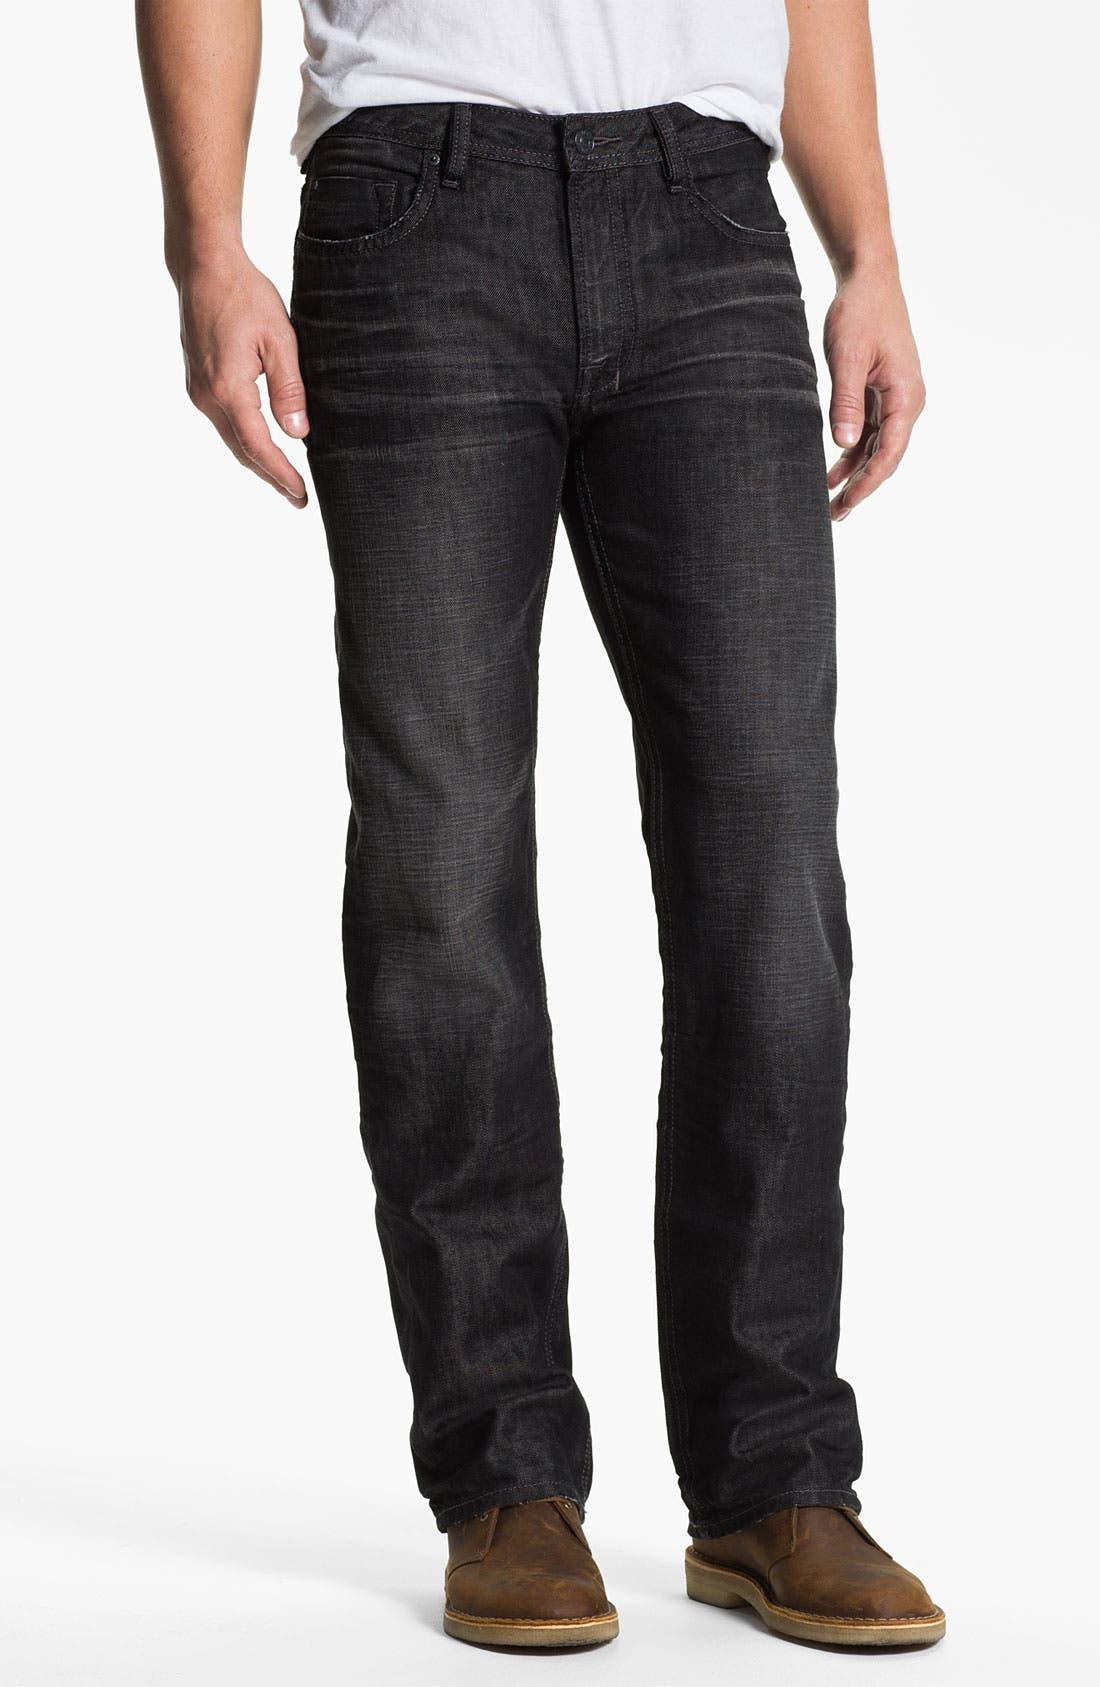 Main Image - Buffalo Jeans 'Driven' Straight Leg Jeans (Dark/Washed)